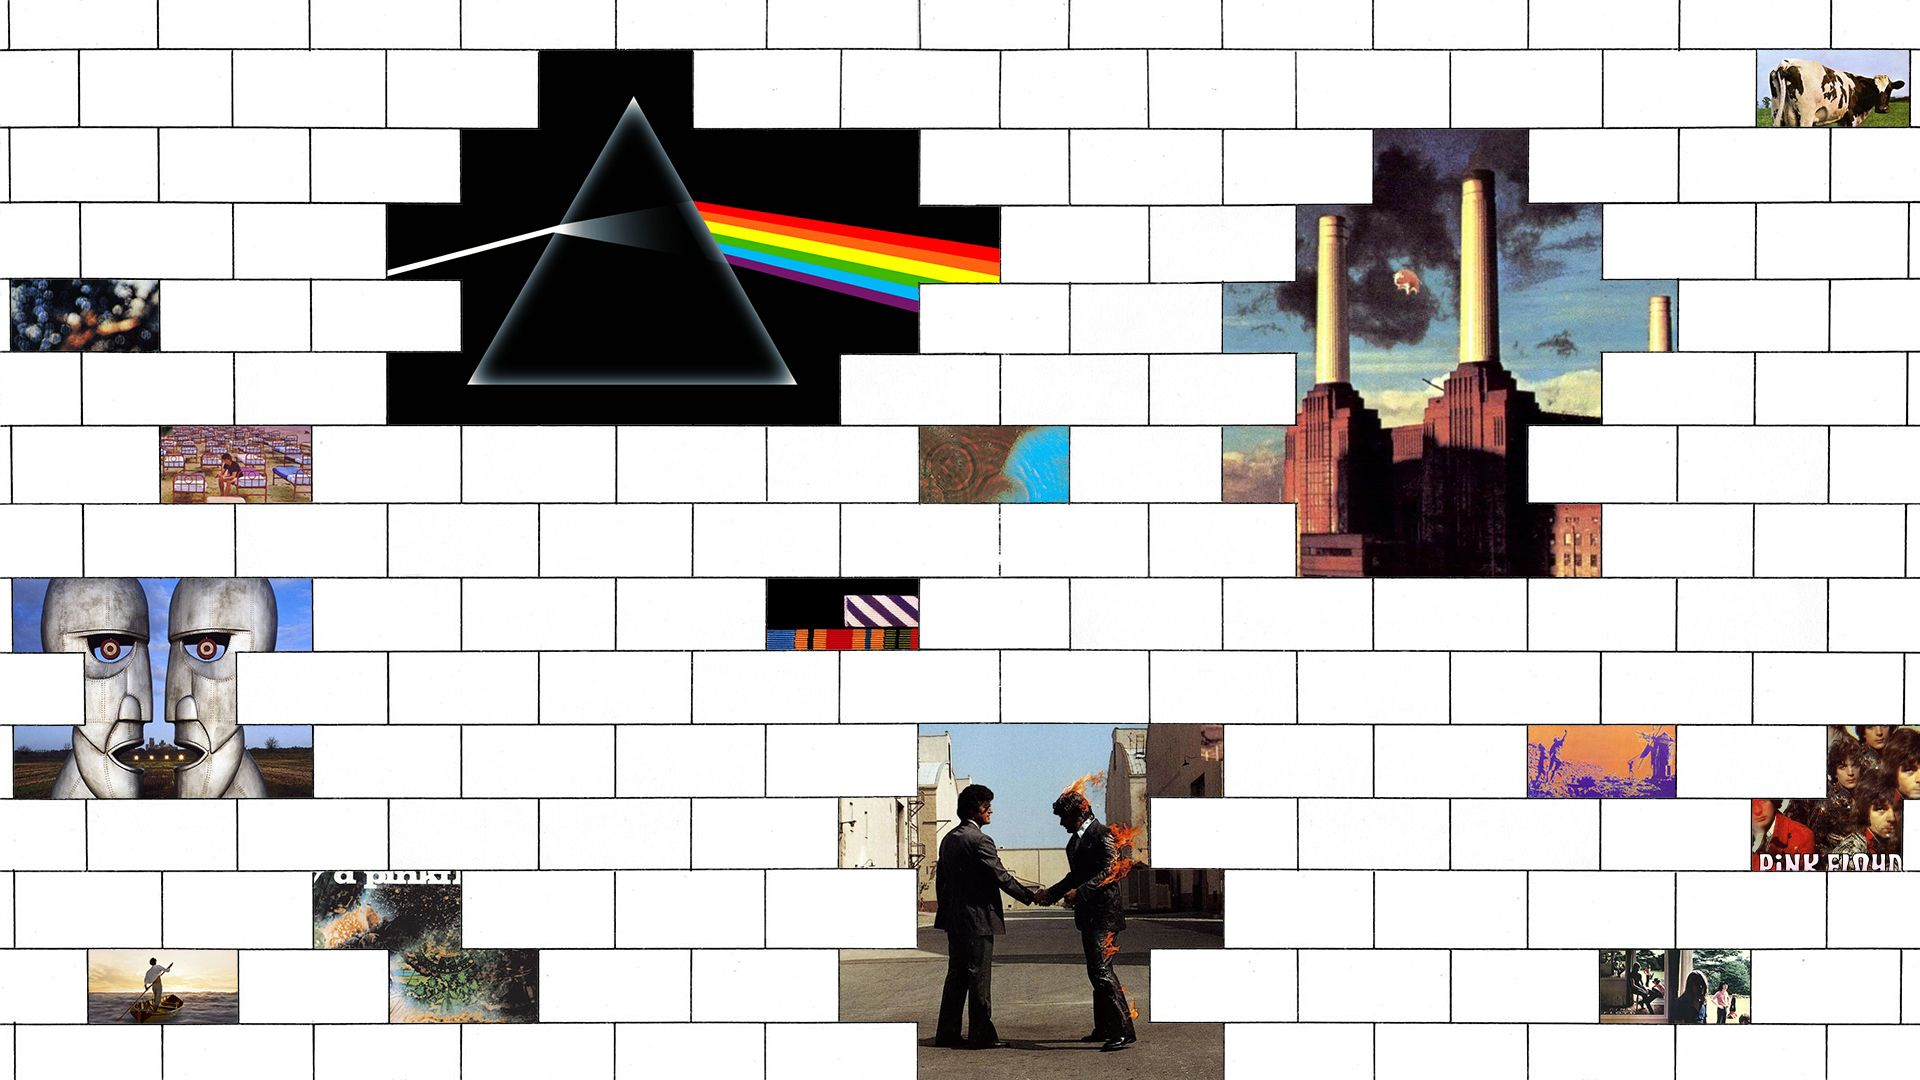 Selfmade Pink Floyd wallpaper [1920x1080] Fondos